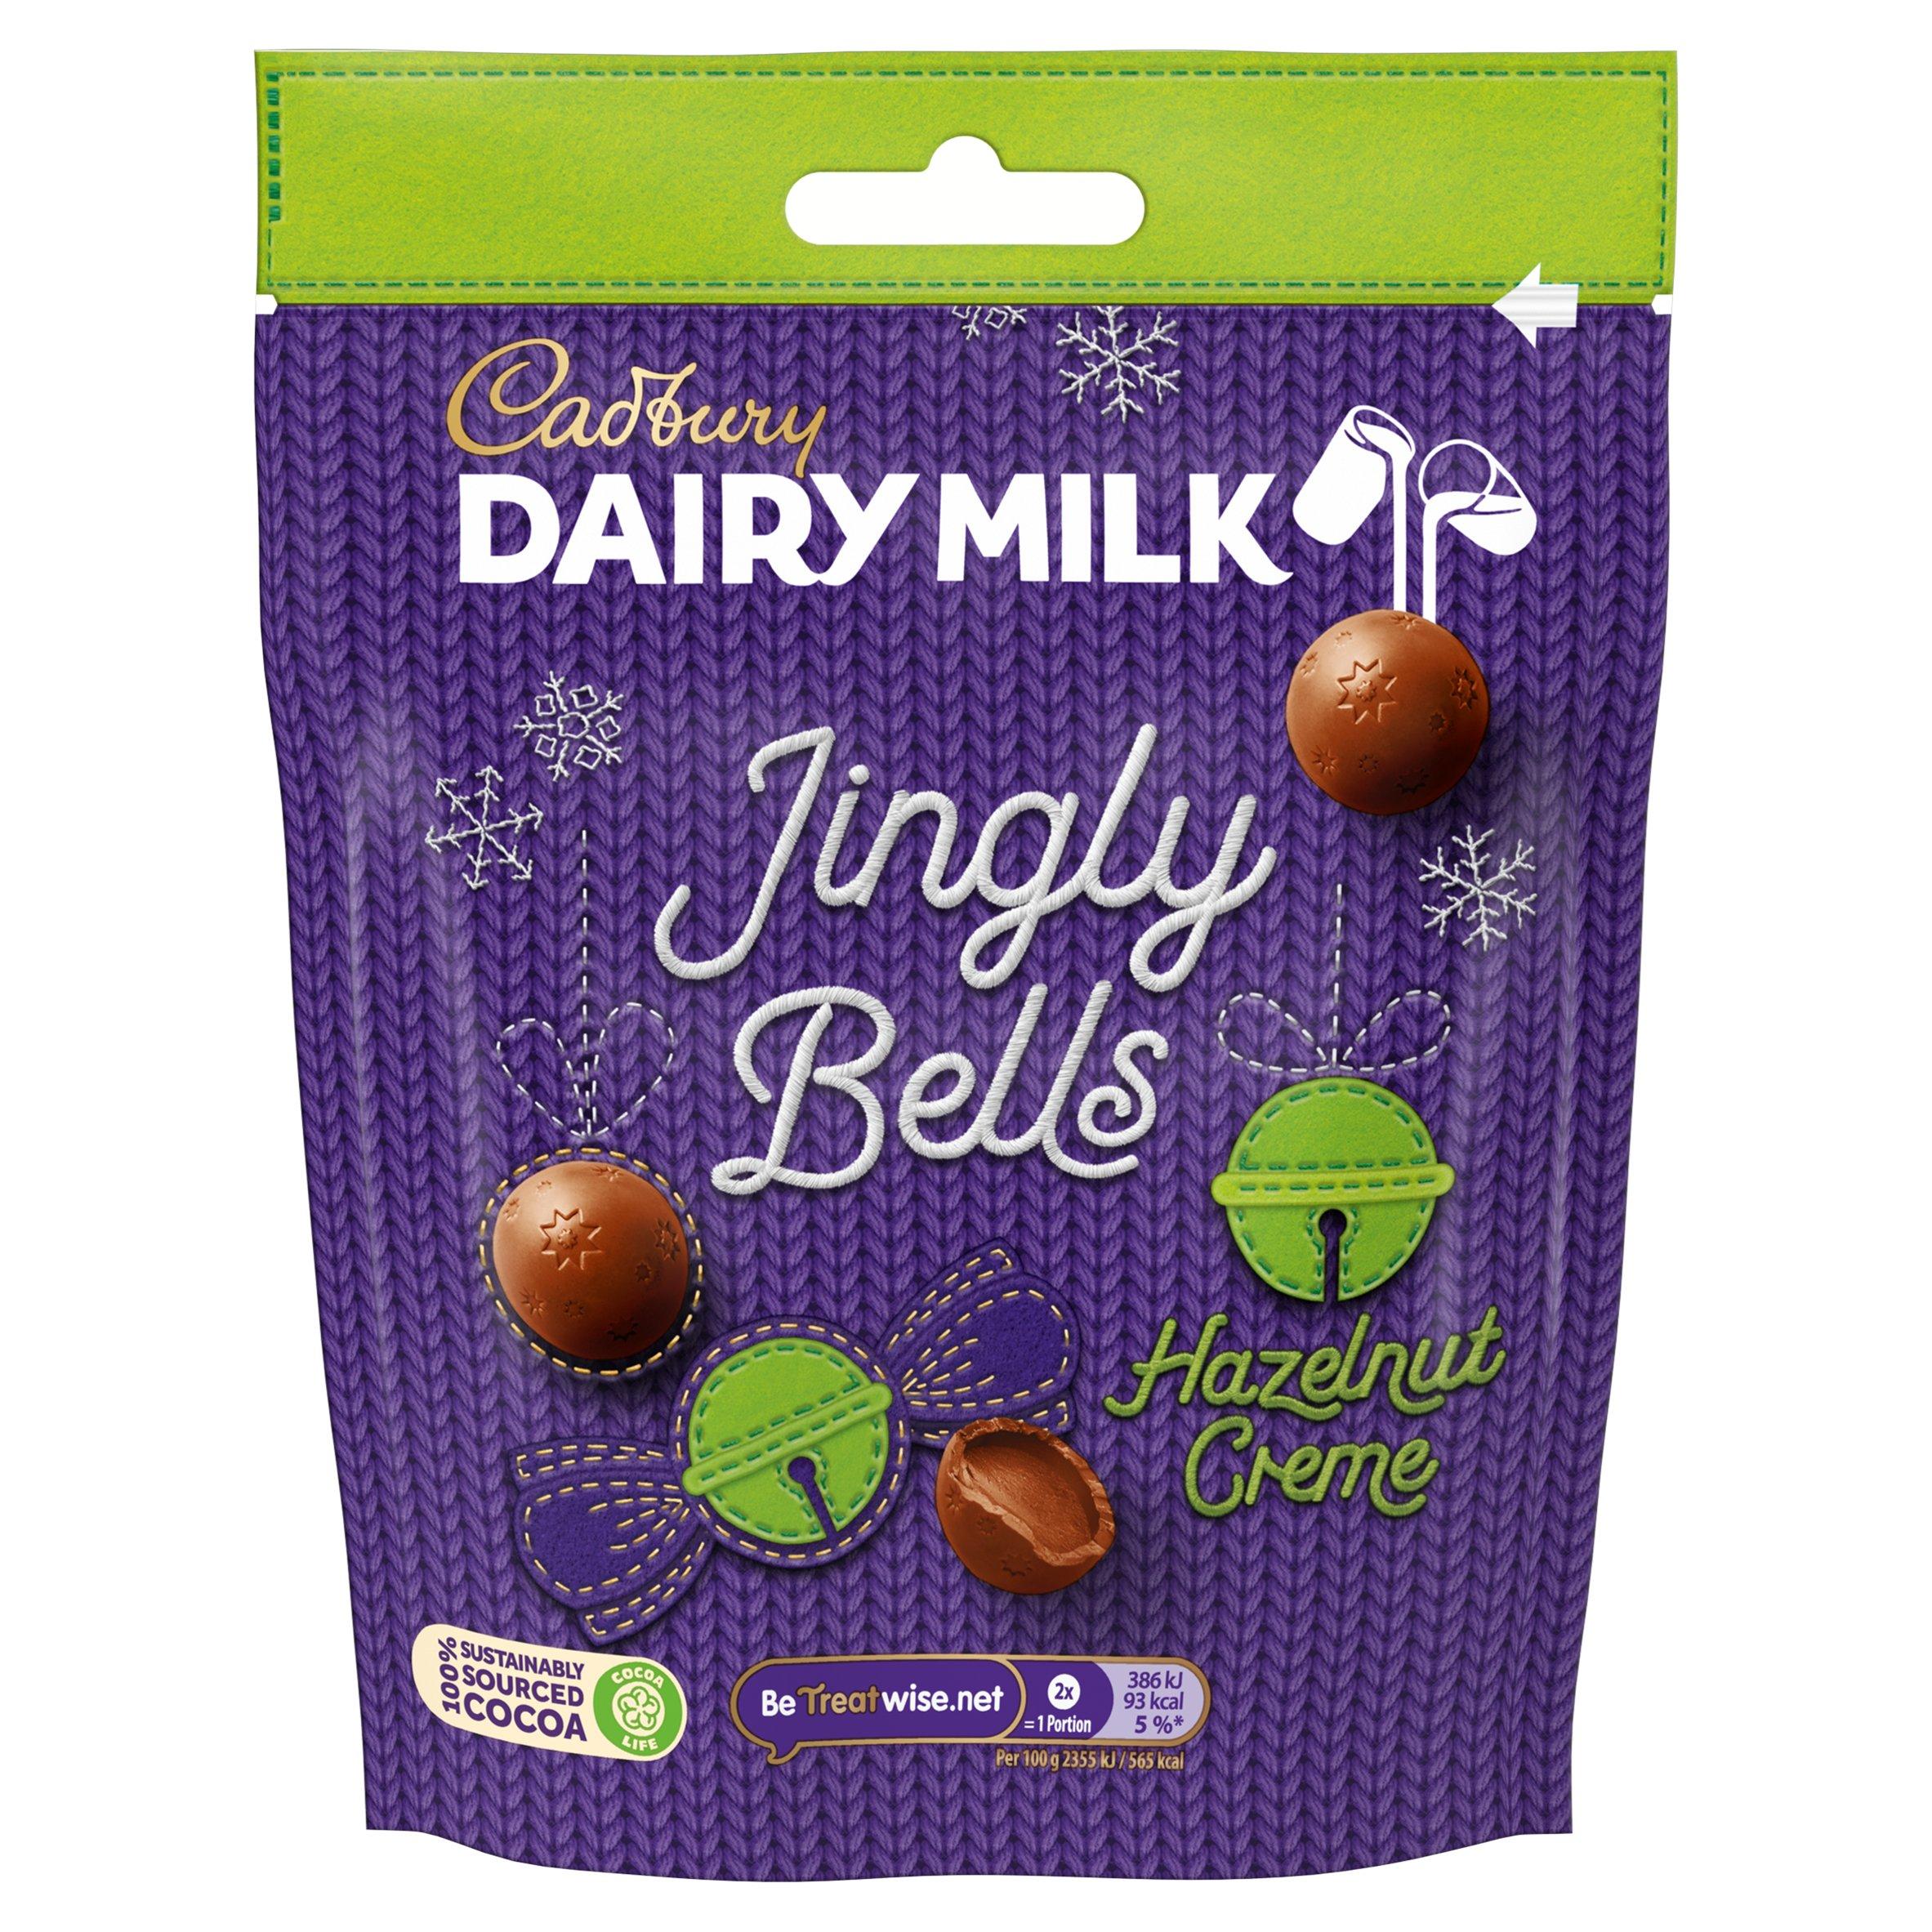 Cadbury Jingly Bells Hazelnut Creme 73G